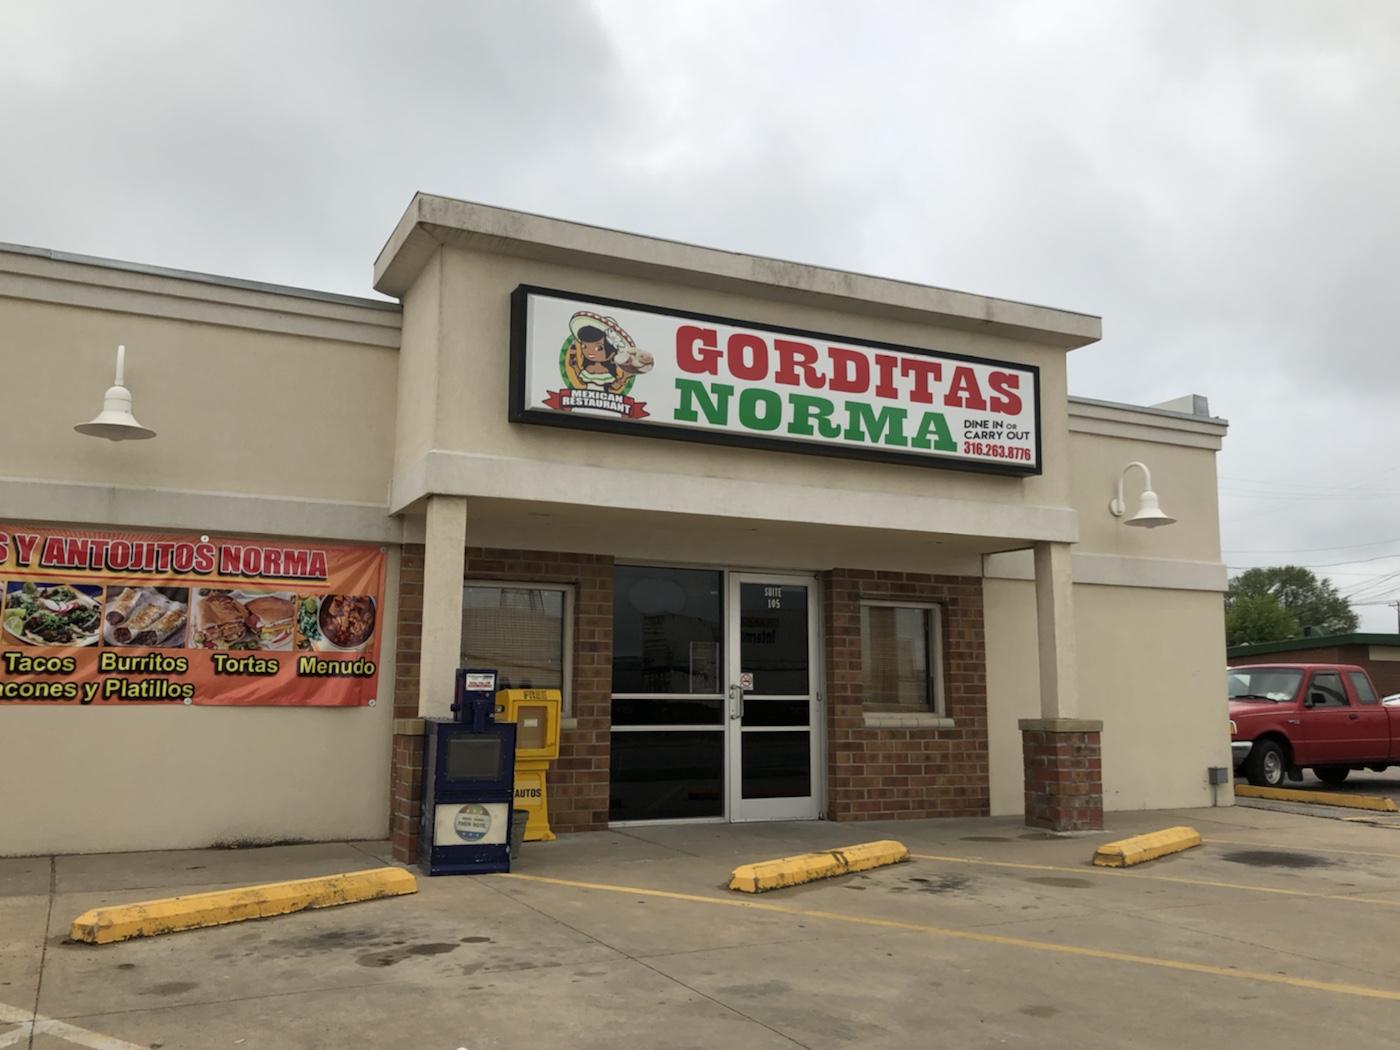 Gordita's Norma